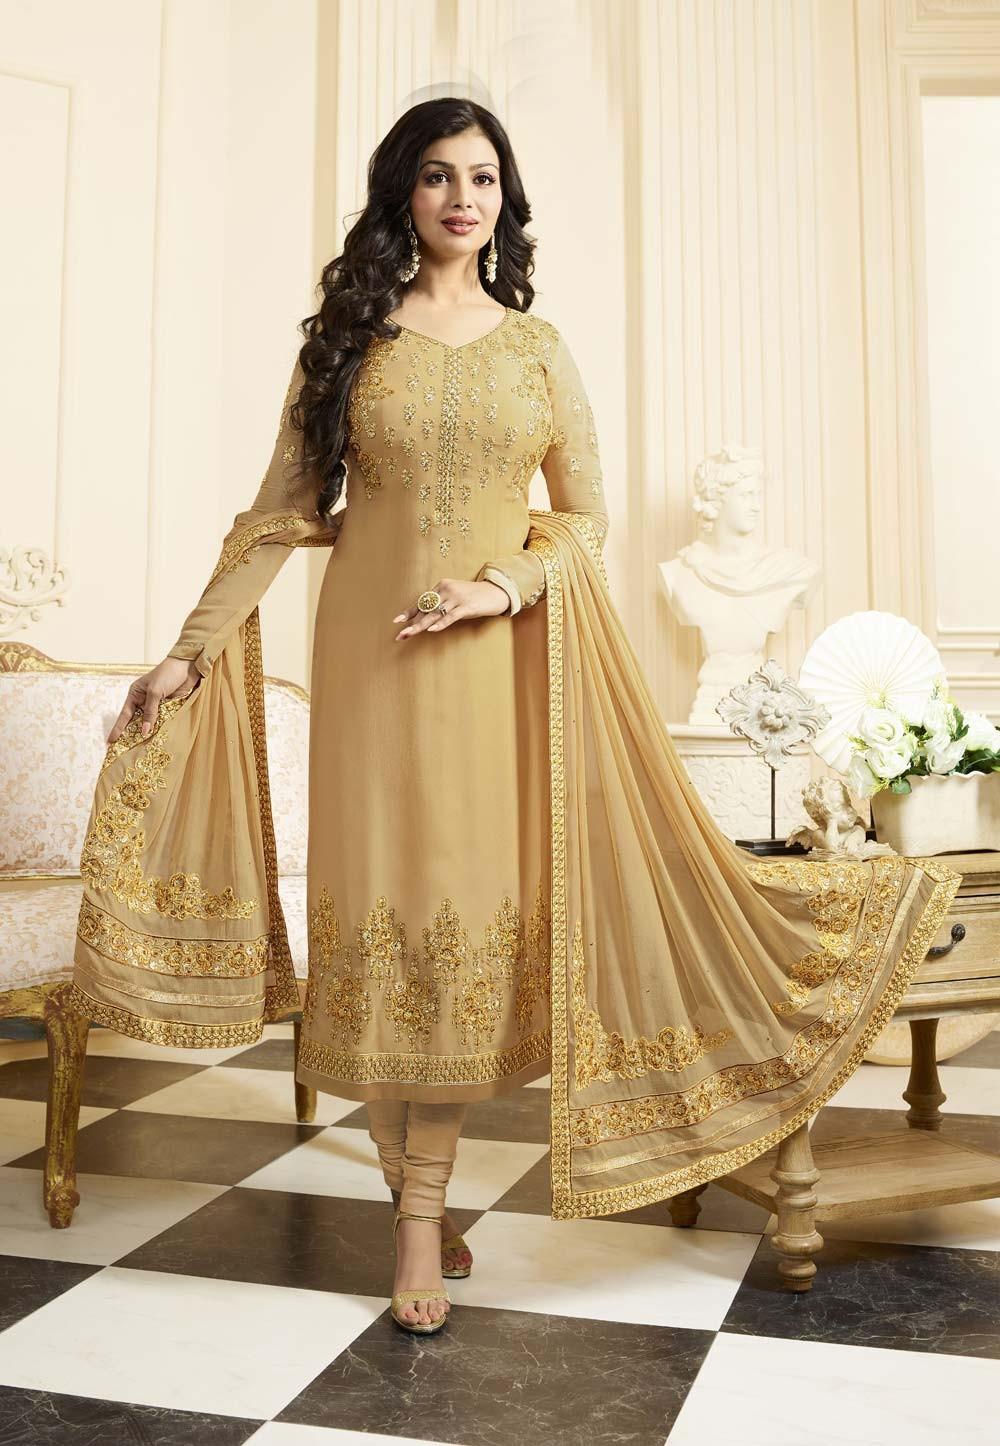 Beige,Golden Color with Embroidery Work Astounding Unstitched Salwar Kameez